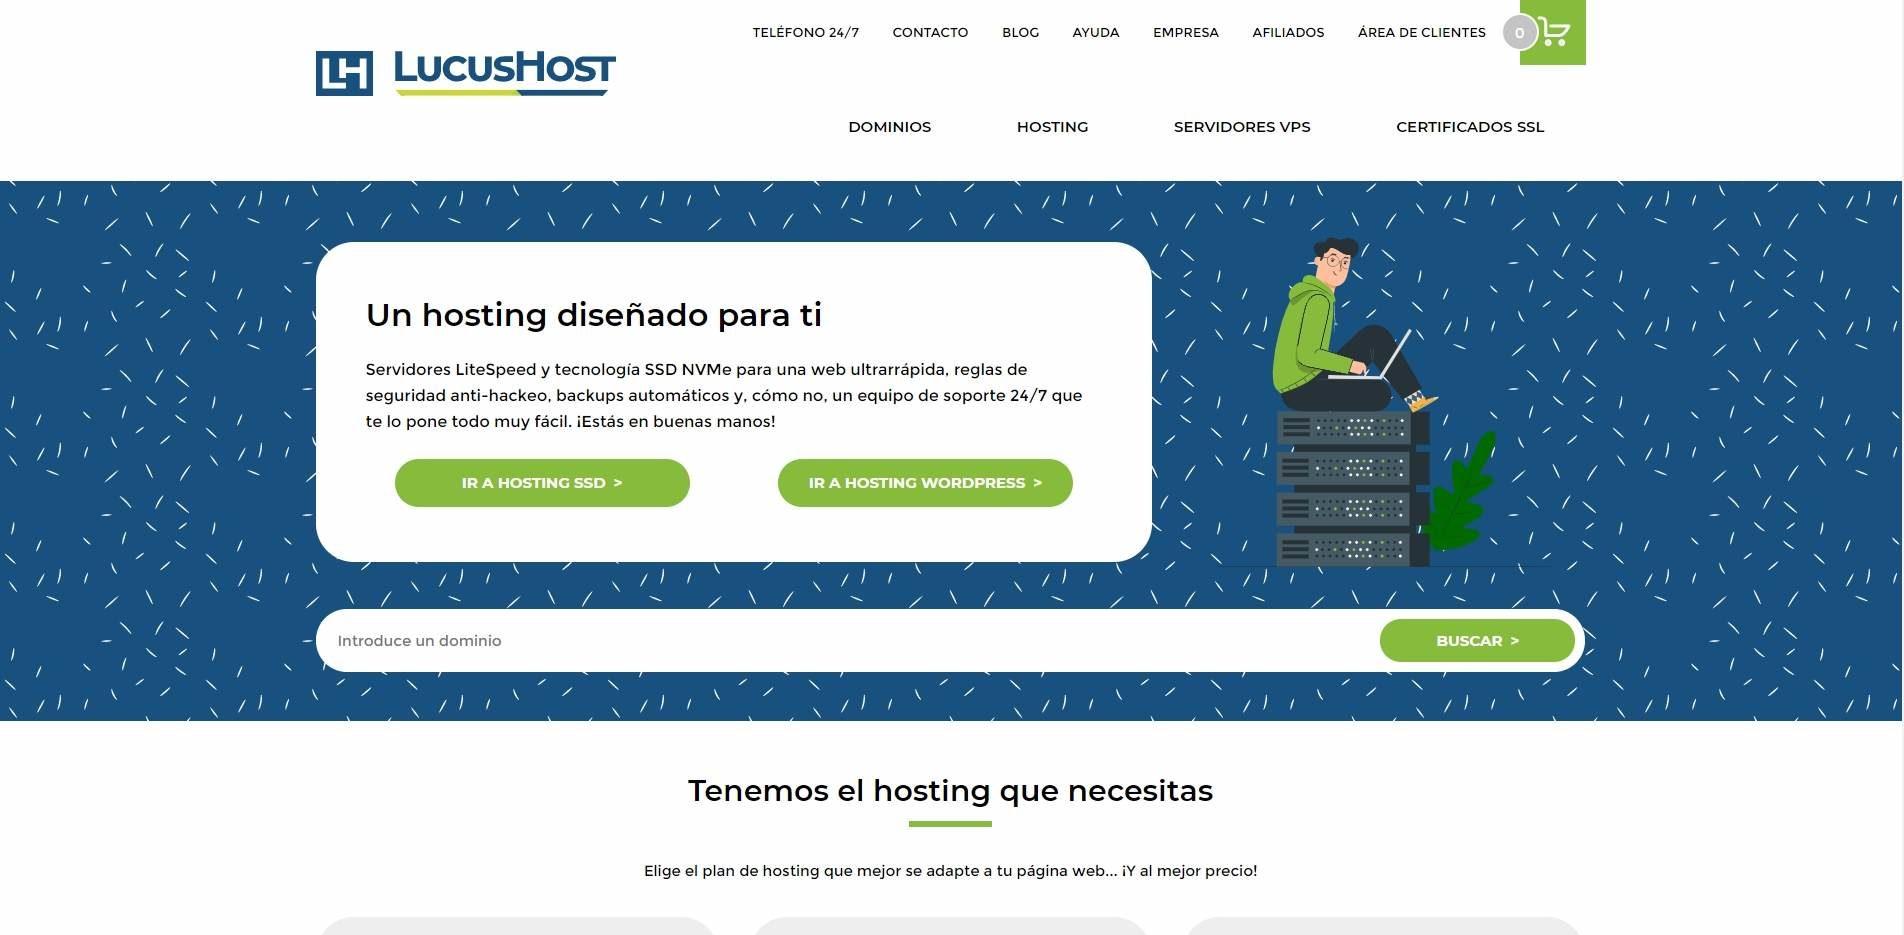 Lucushost web